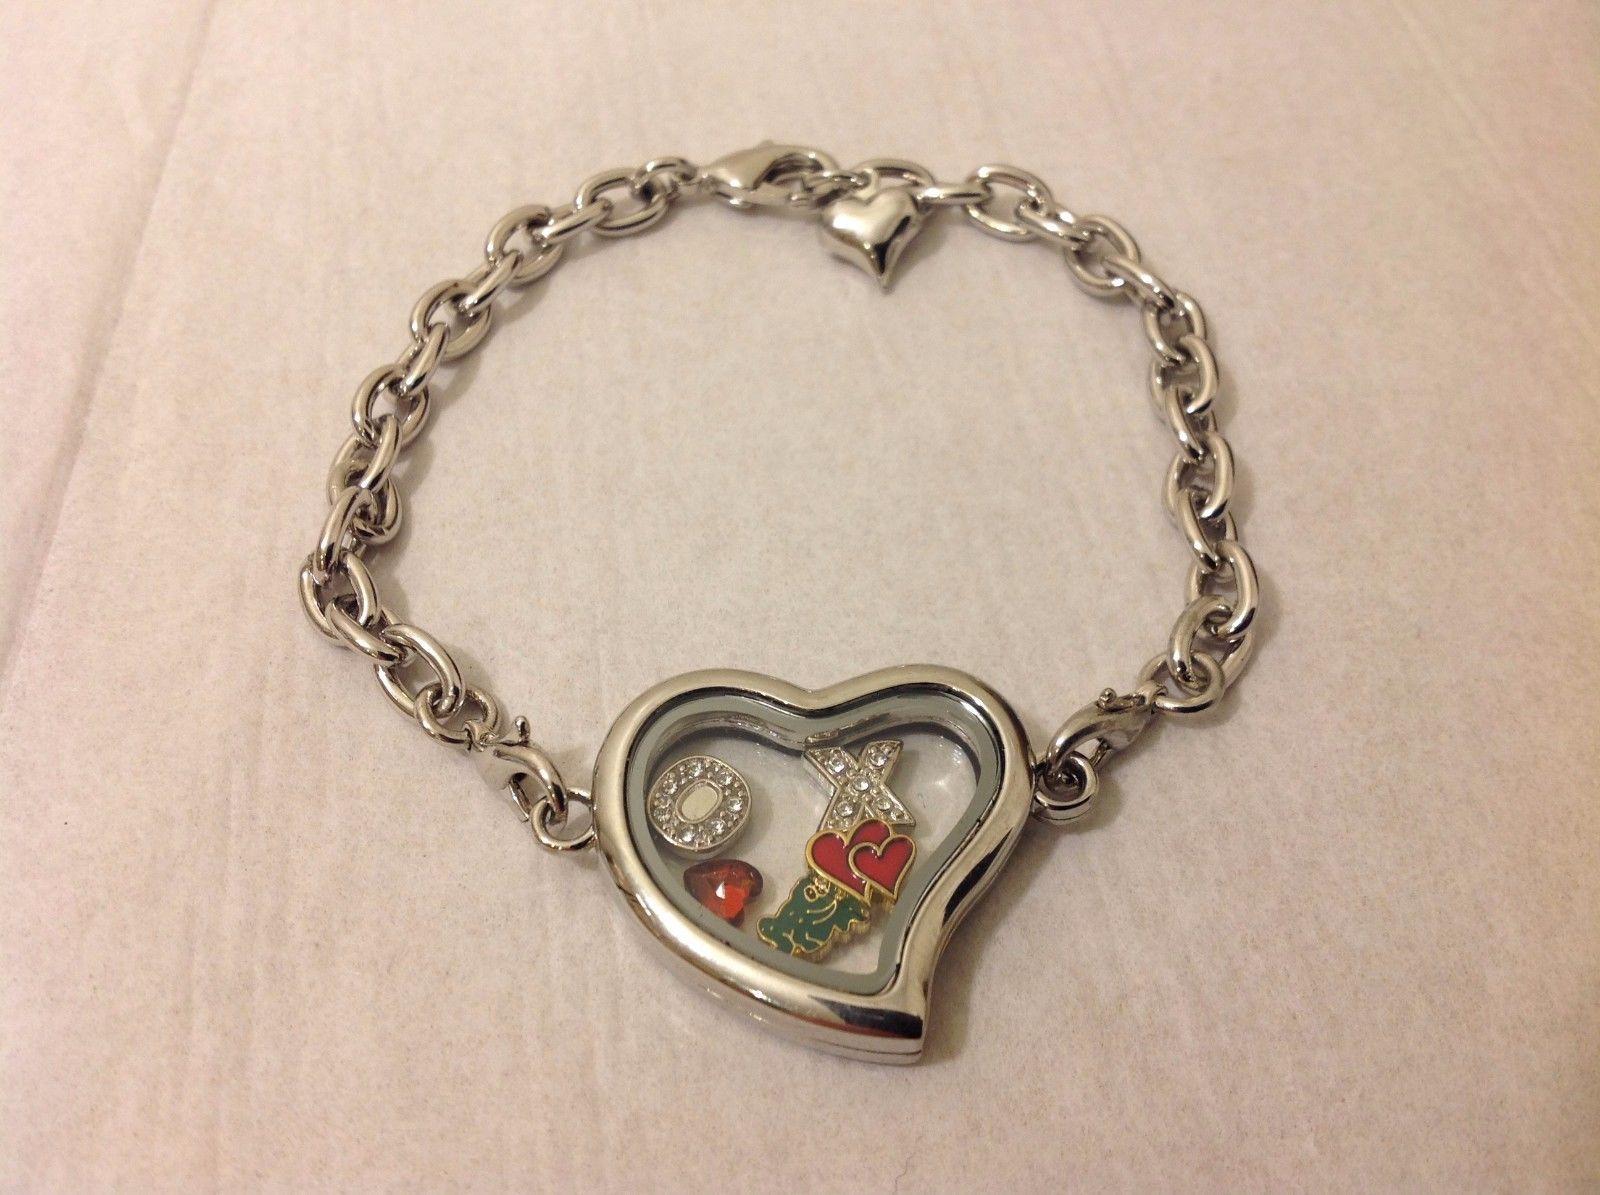 NEW Silver Toned Bracelet Heart Pendant Mini Charms Inside Pendant Lobster Clasp